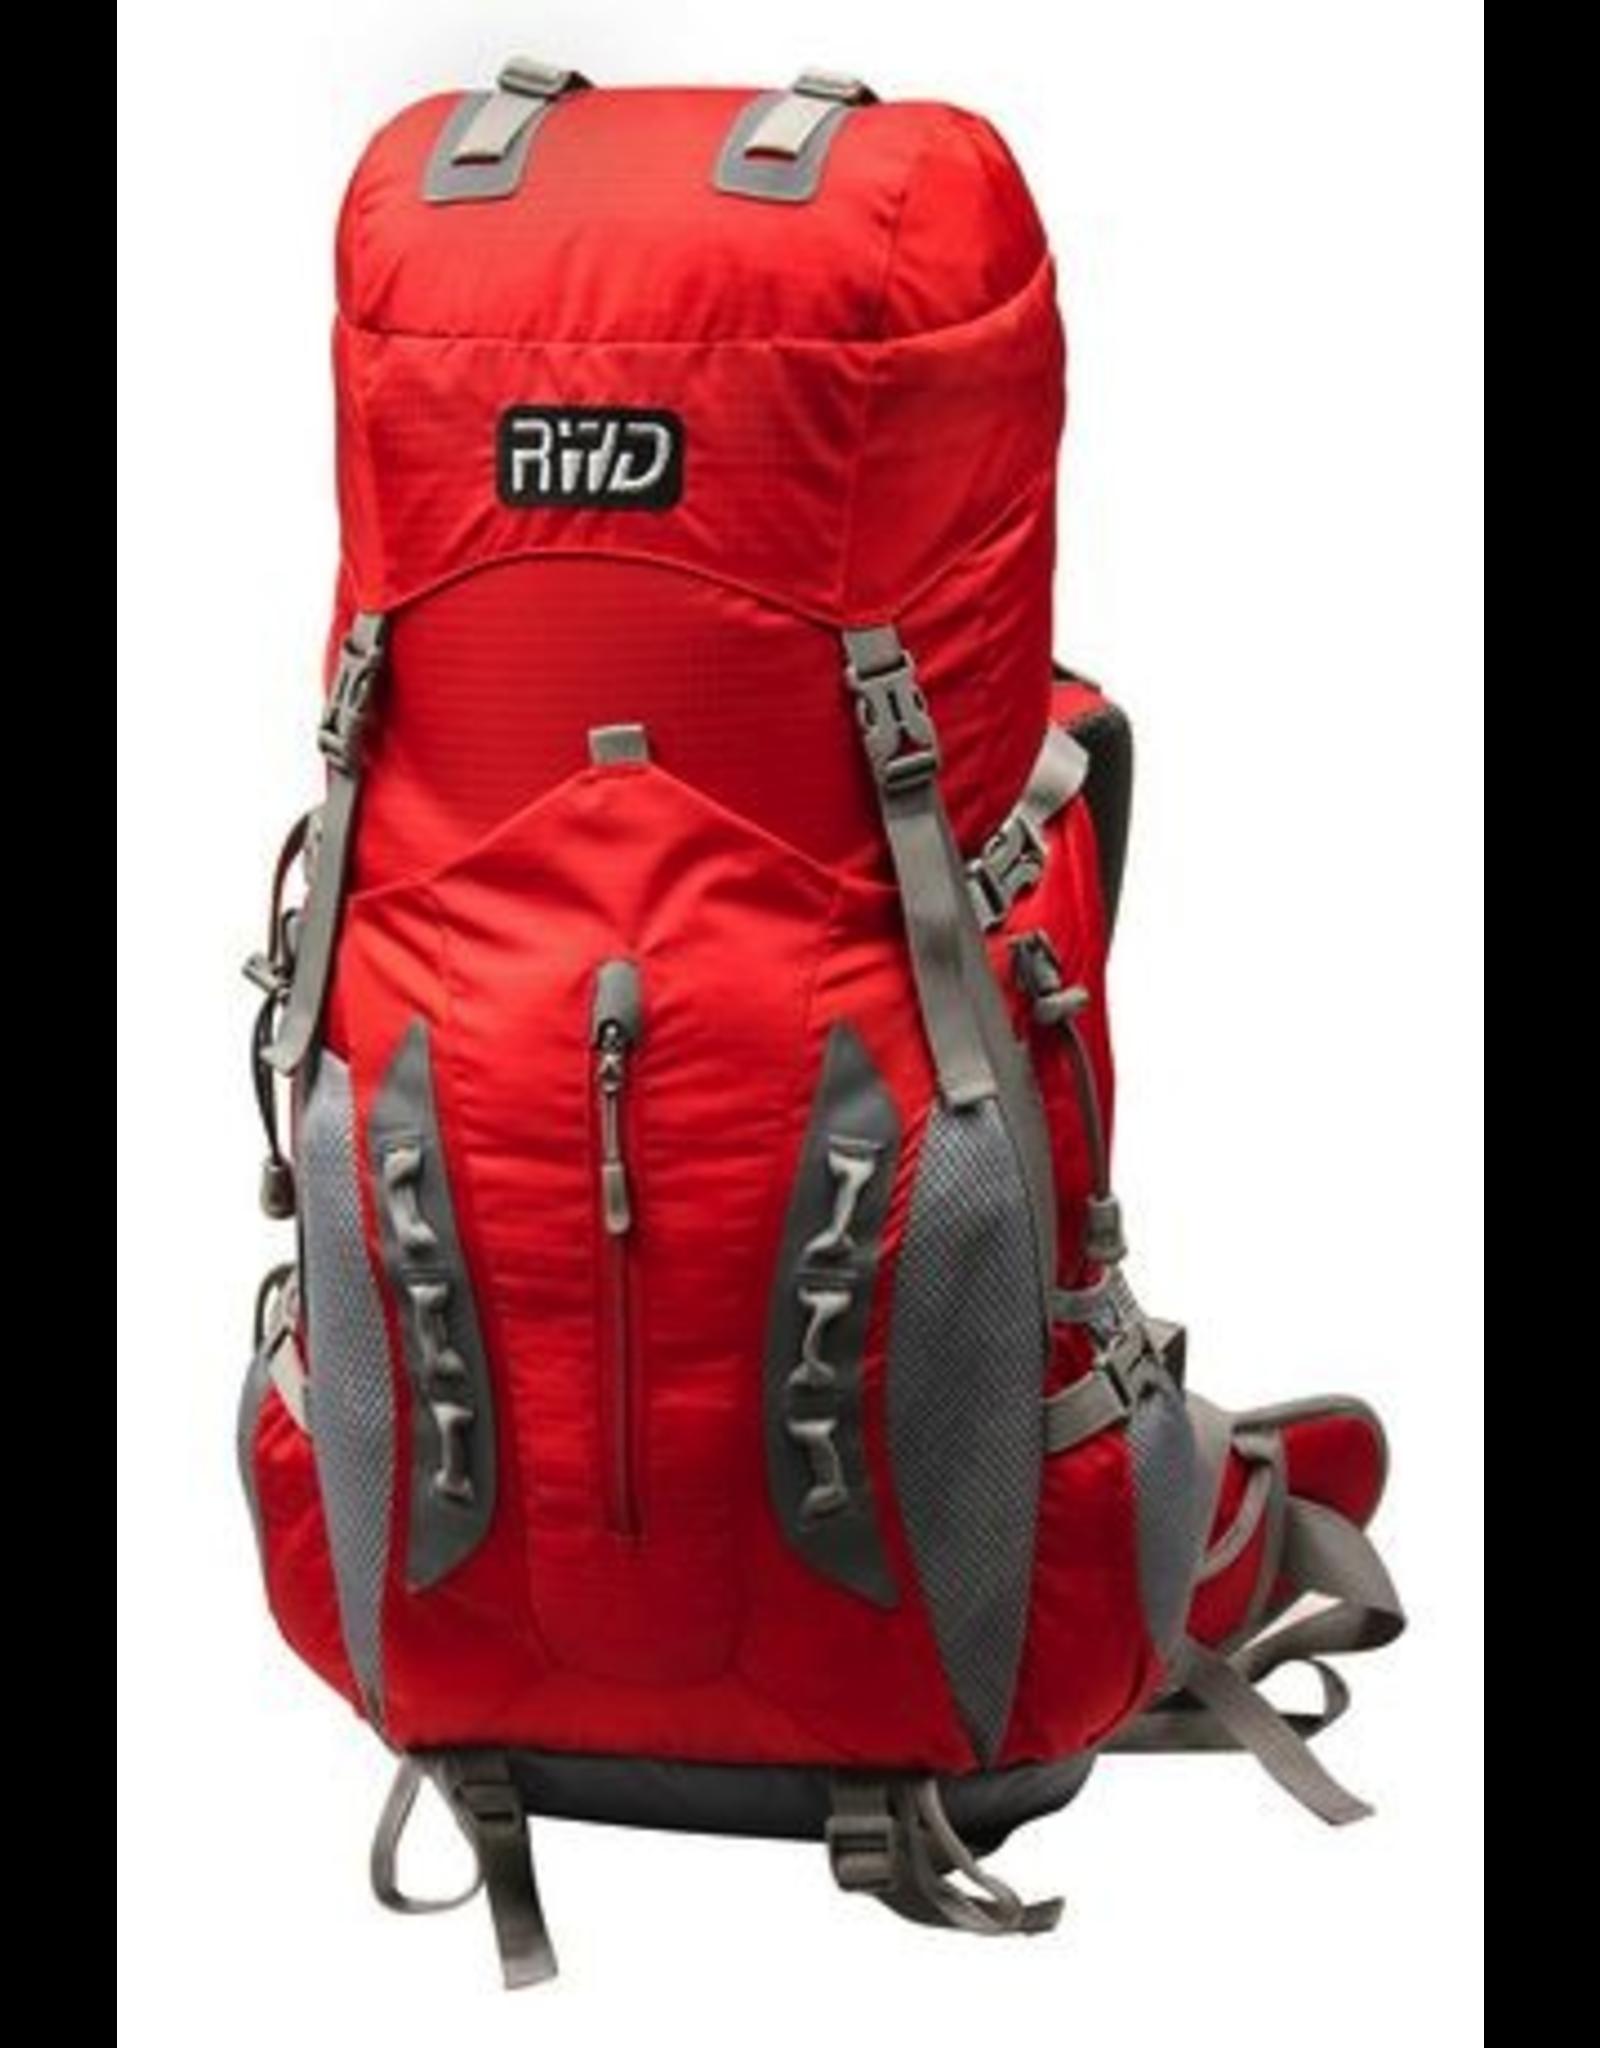 Rockwater Designs Rockwater Designs Napier Backpack 50L, Red